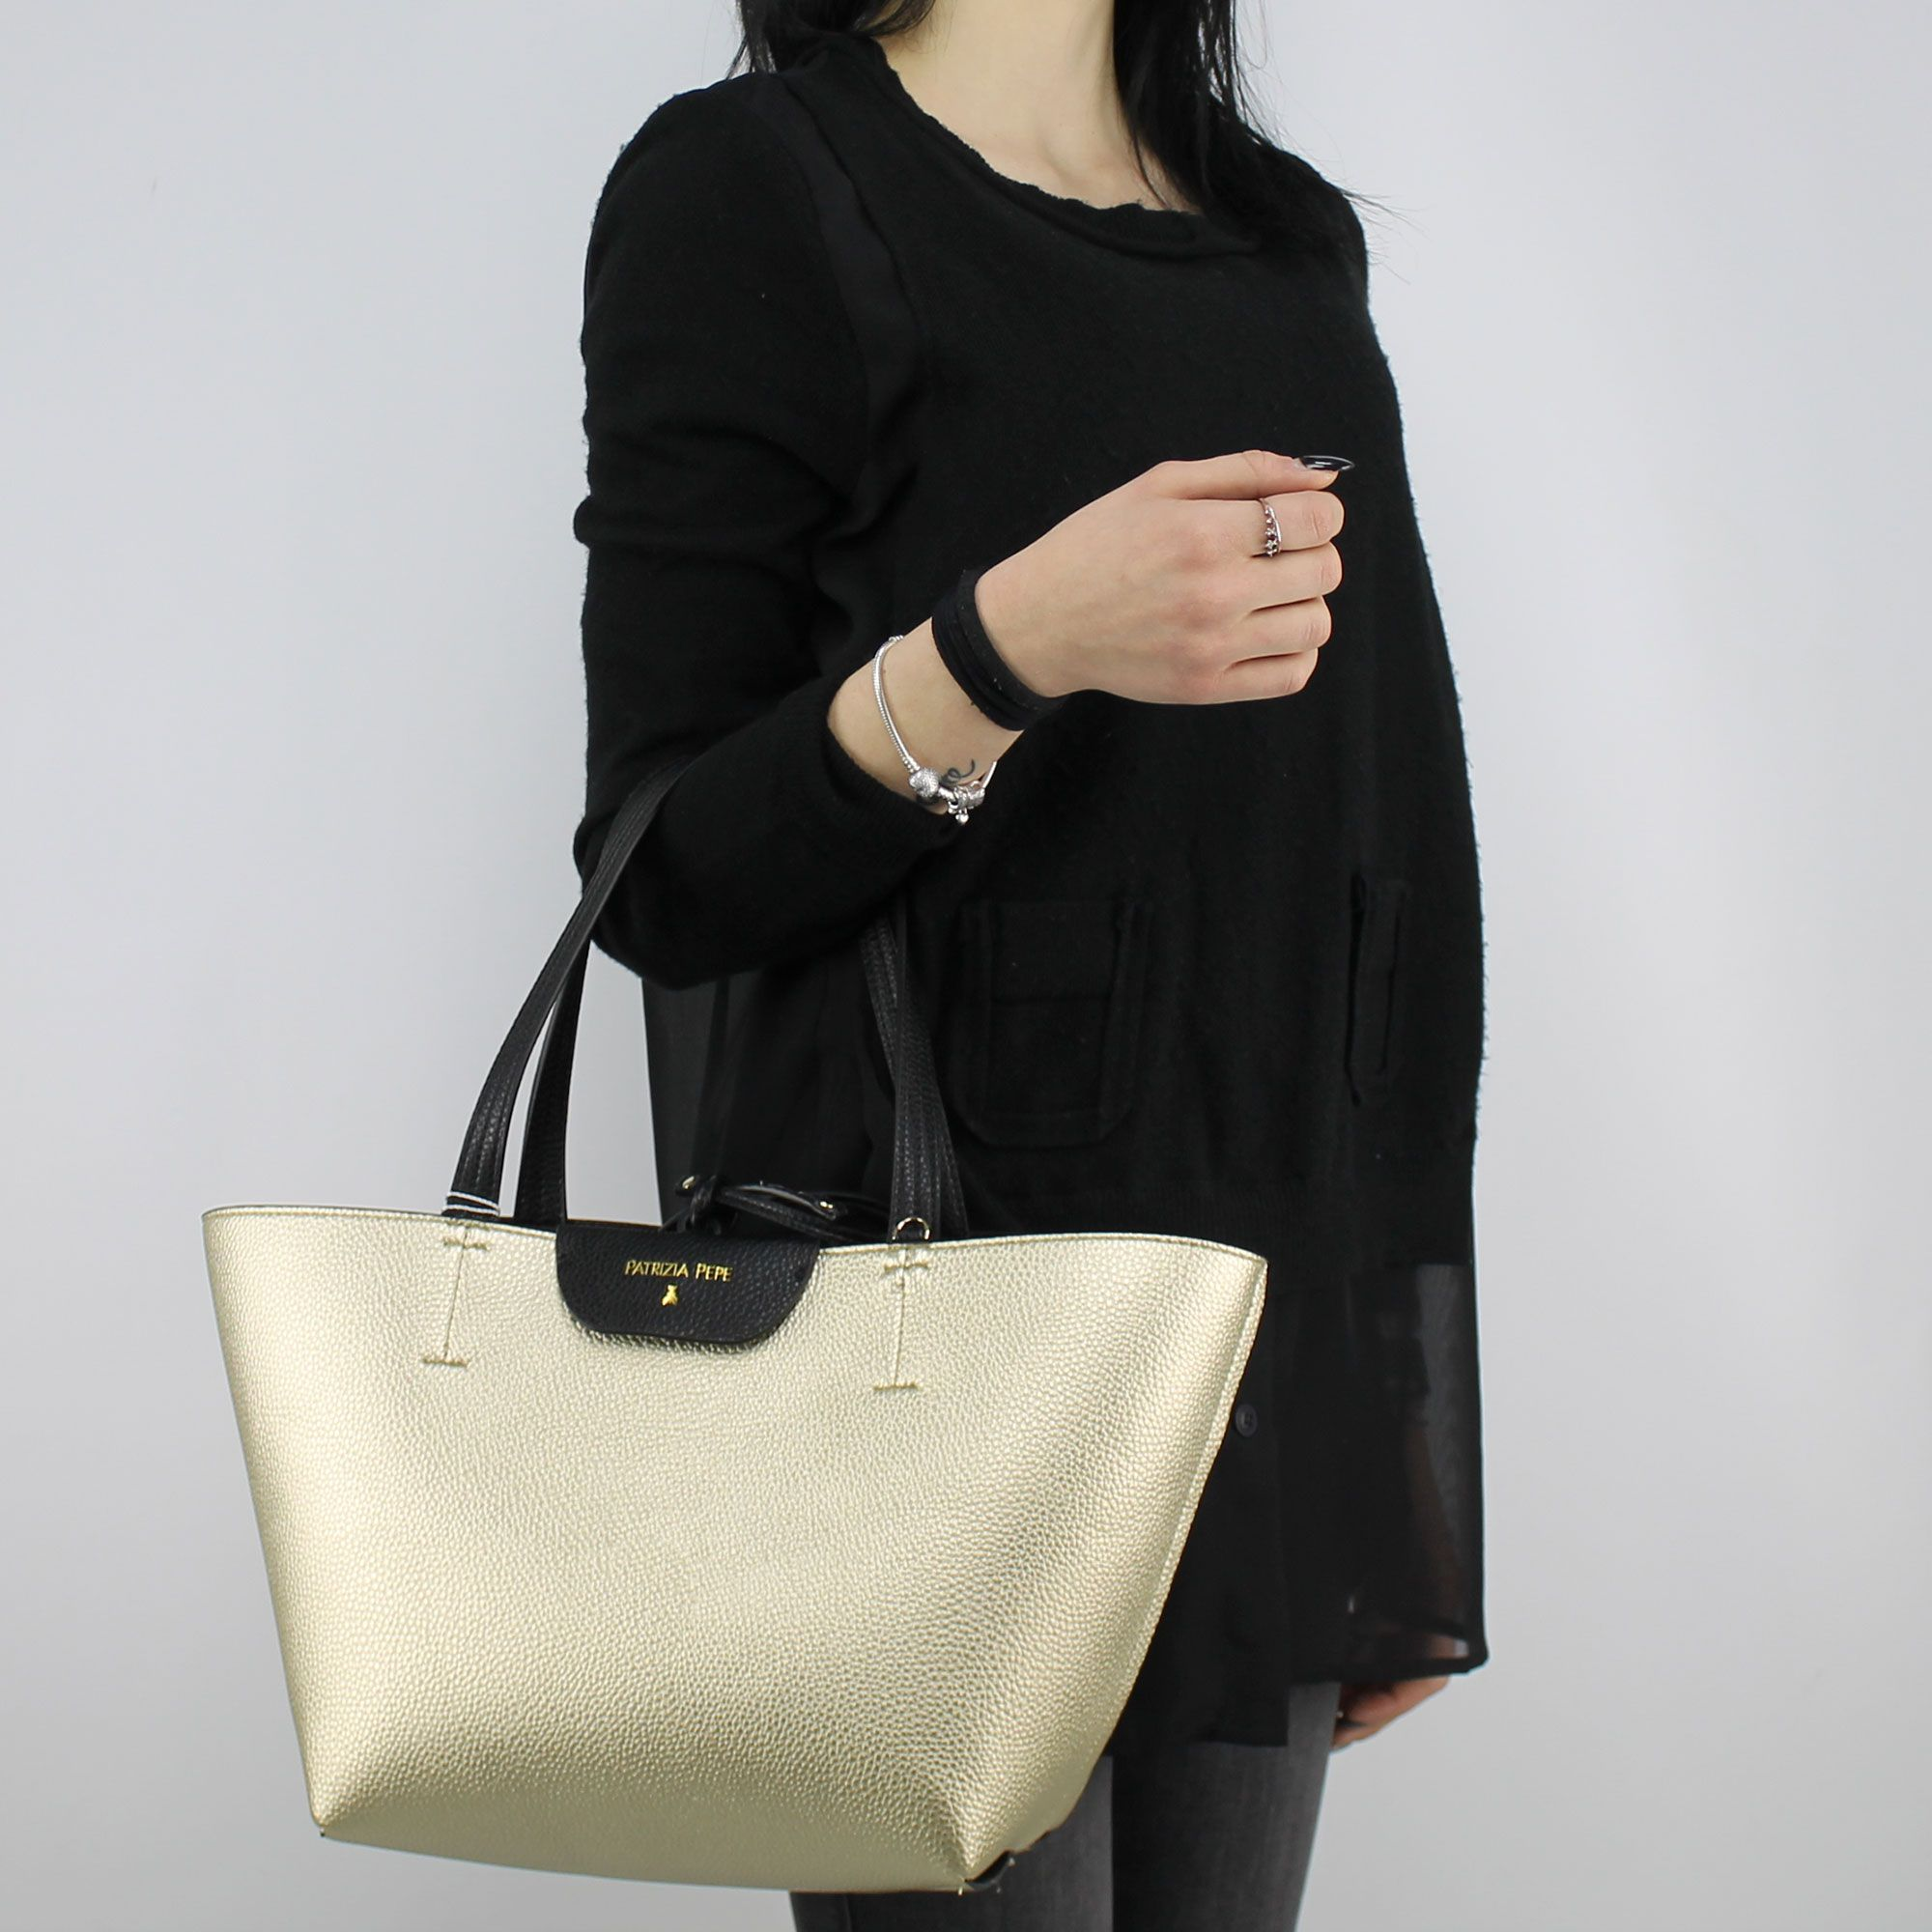 Borsa Shopping reversibile Patrizia Pepe nera e oro 2V5516